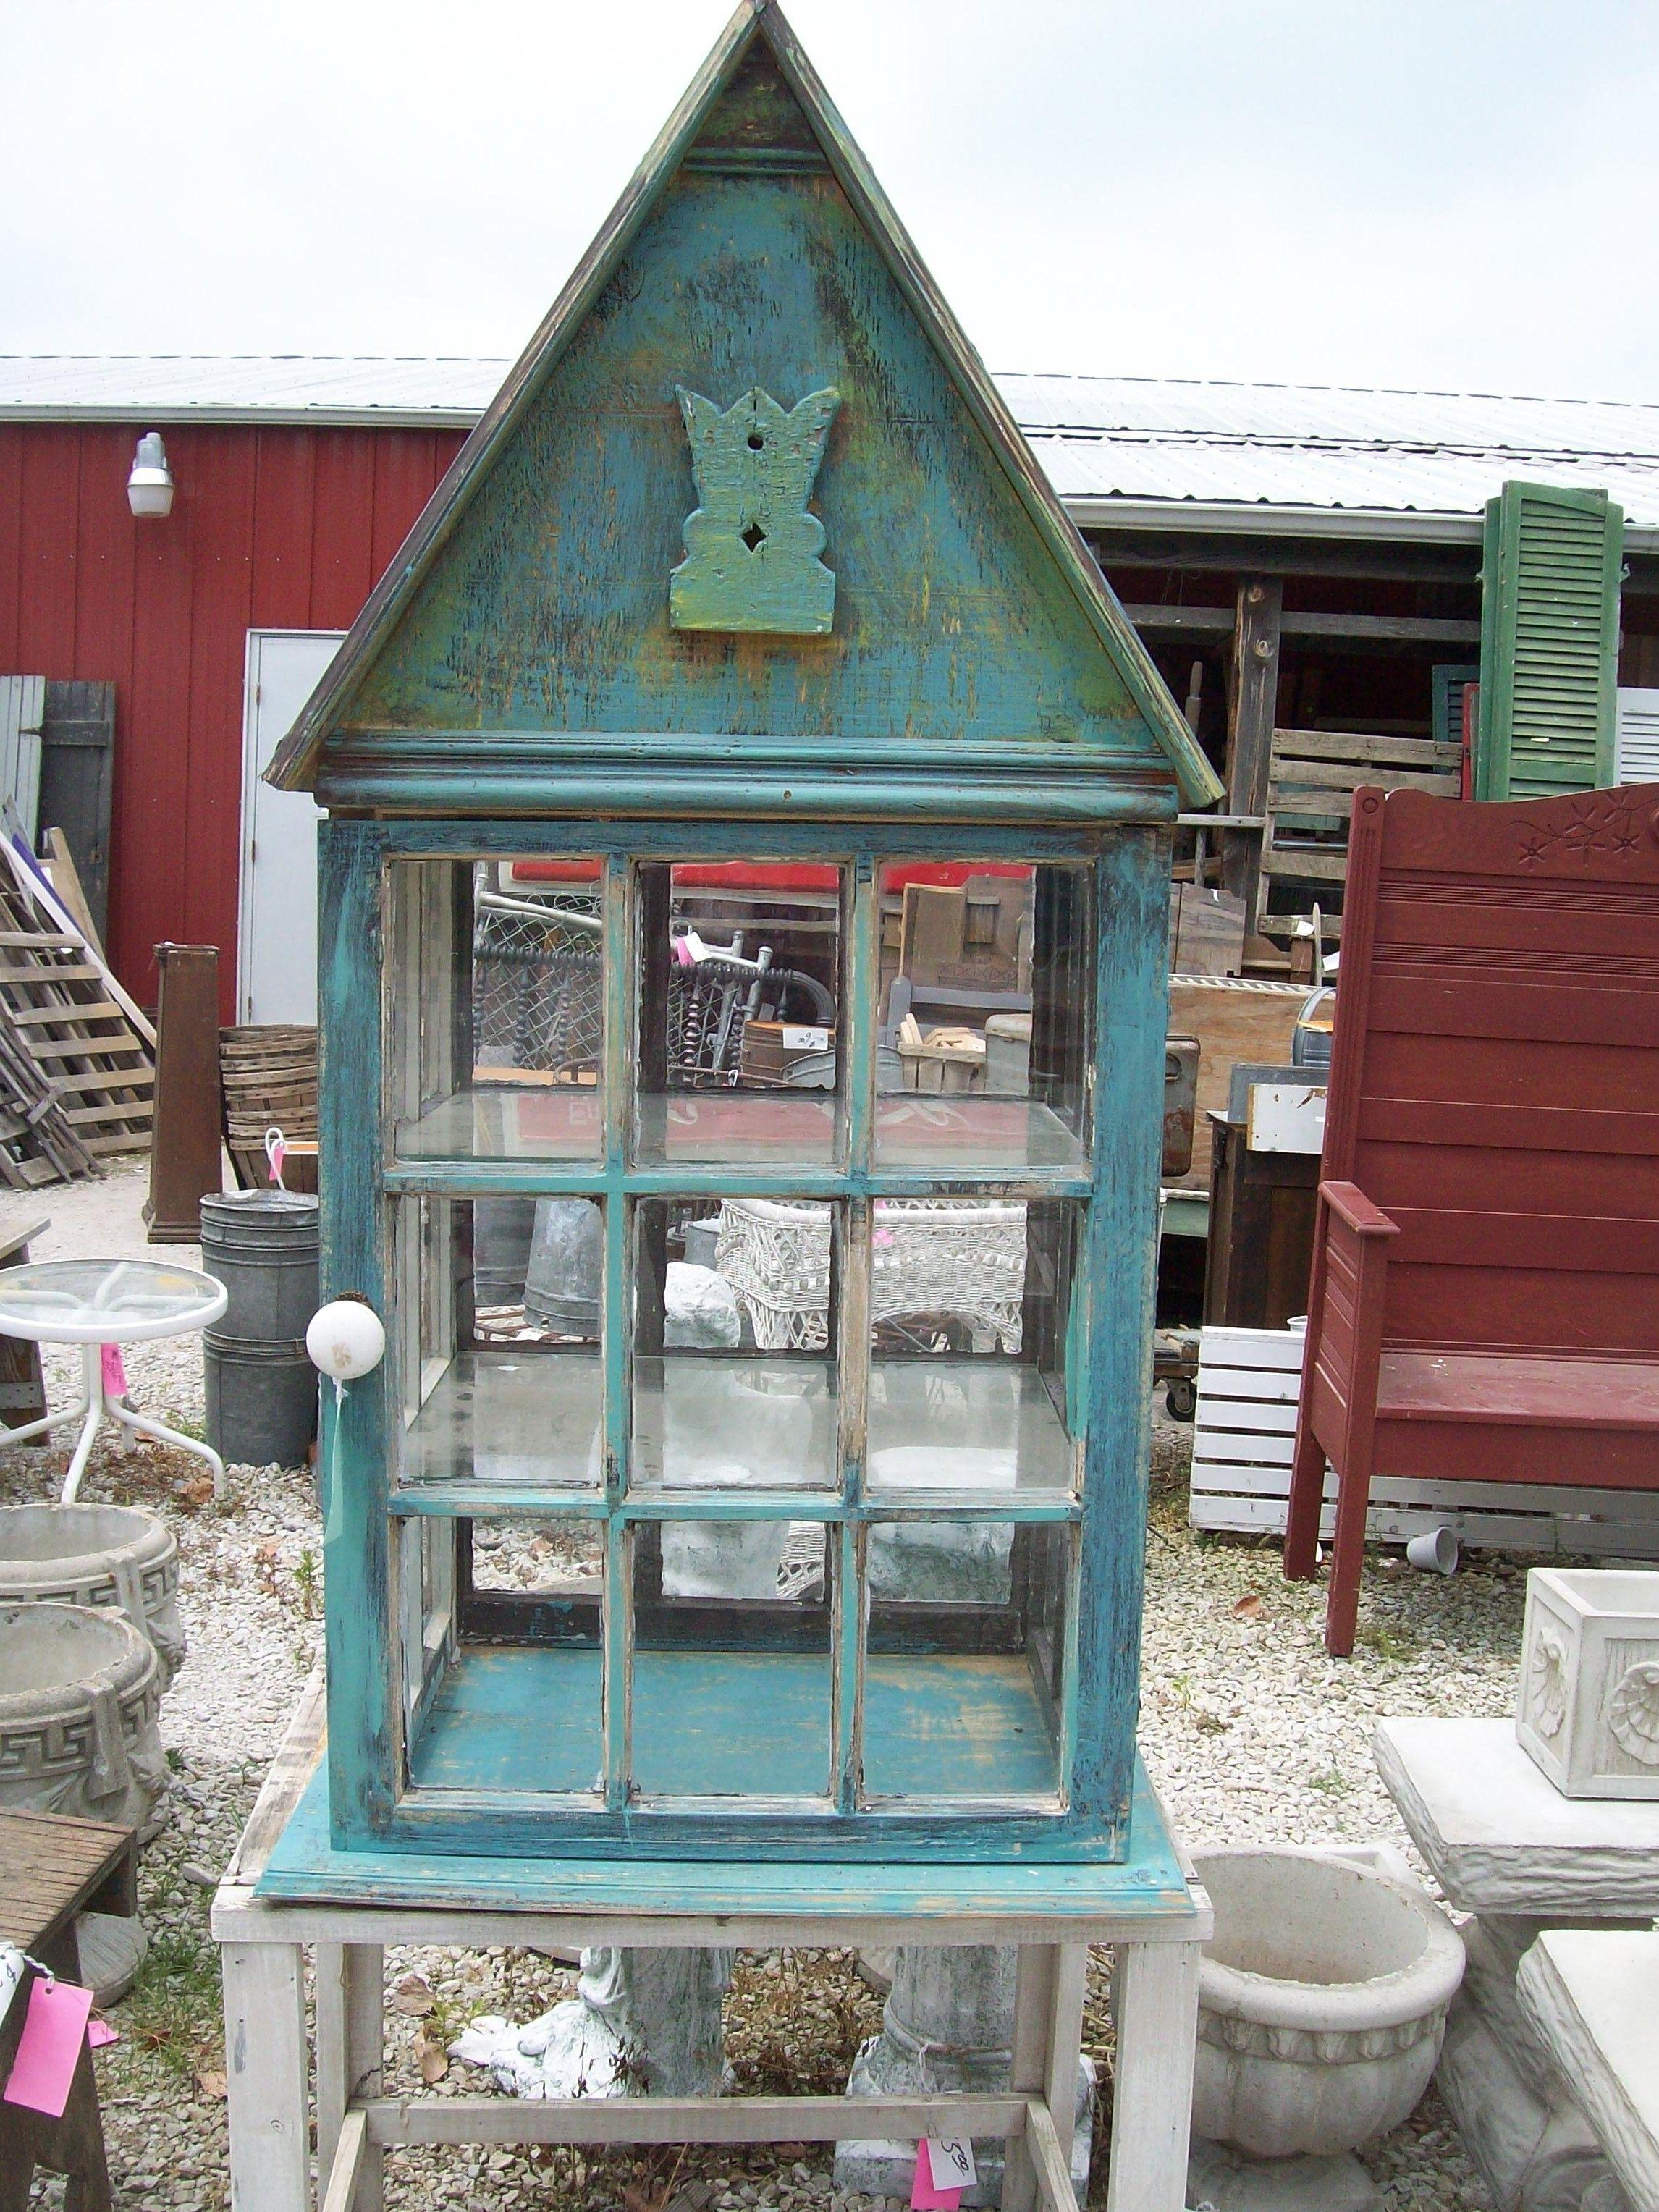 Kitchen Greenhouse Window Table Decorating Ideas Old Windows Terrarium Or A Great Showcase